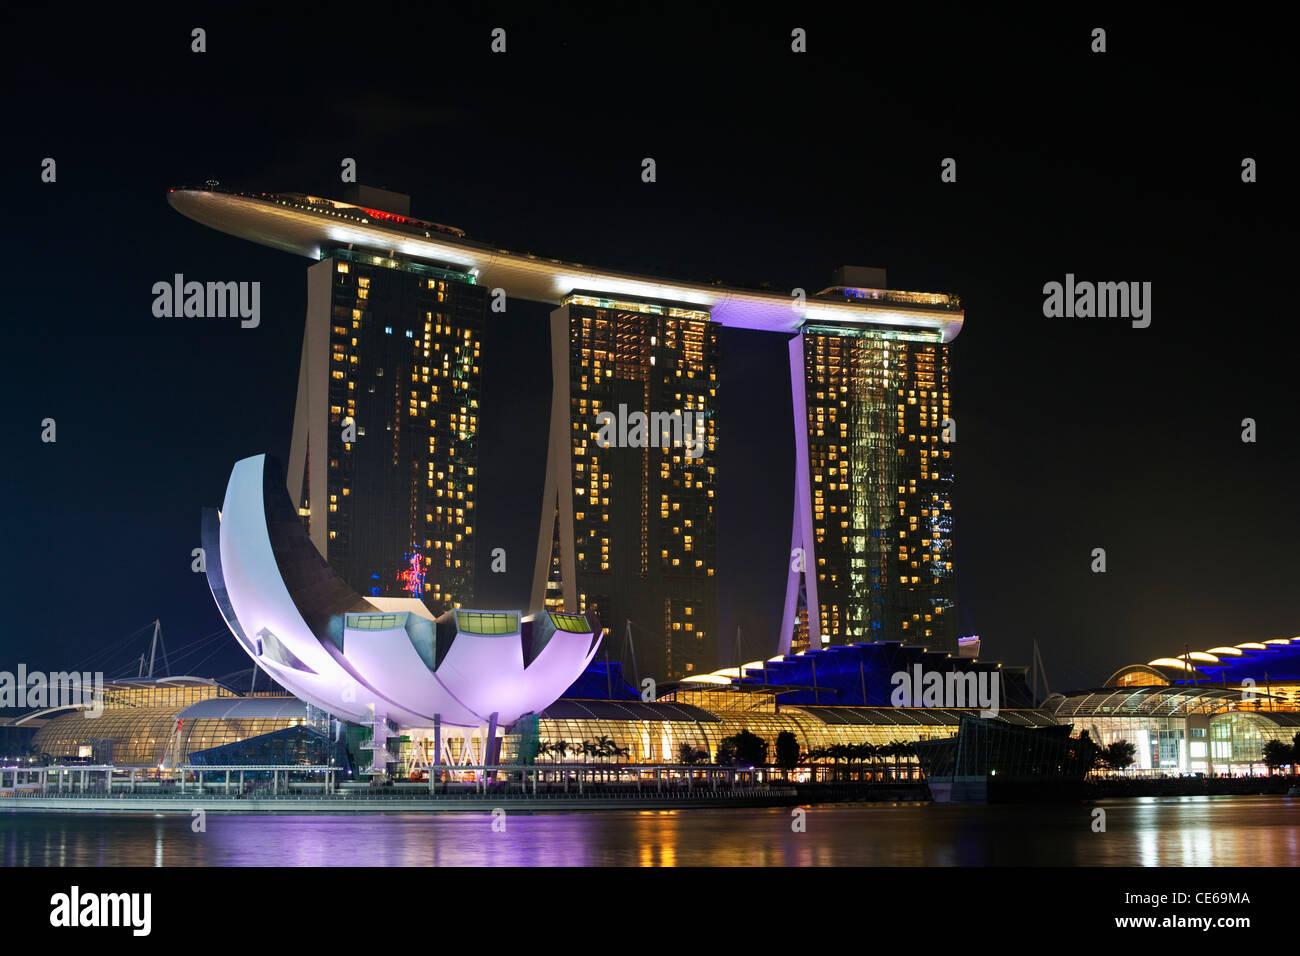 The Marina Bay Sands Singapore.  Marina Bay, Singapore - Stock Image